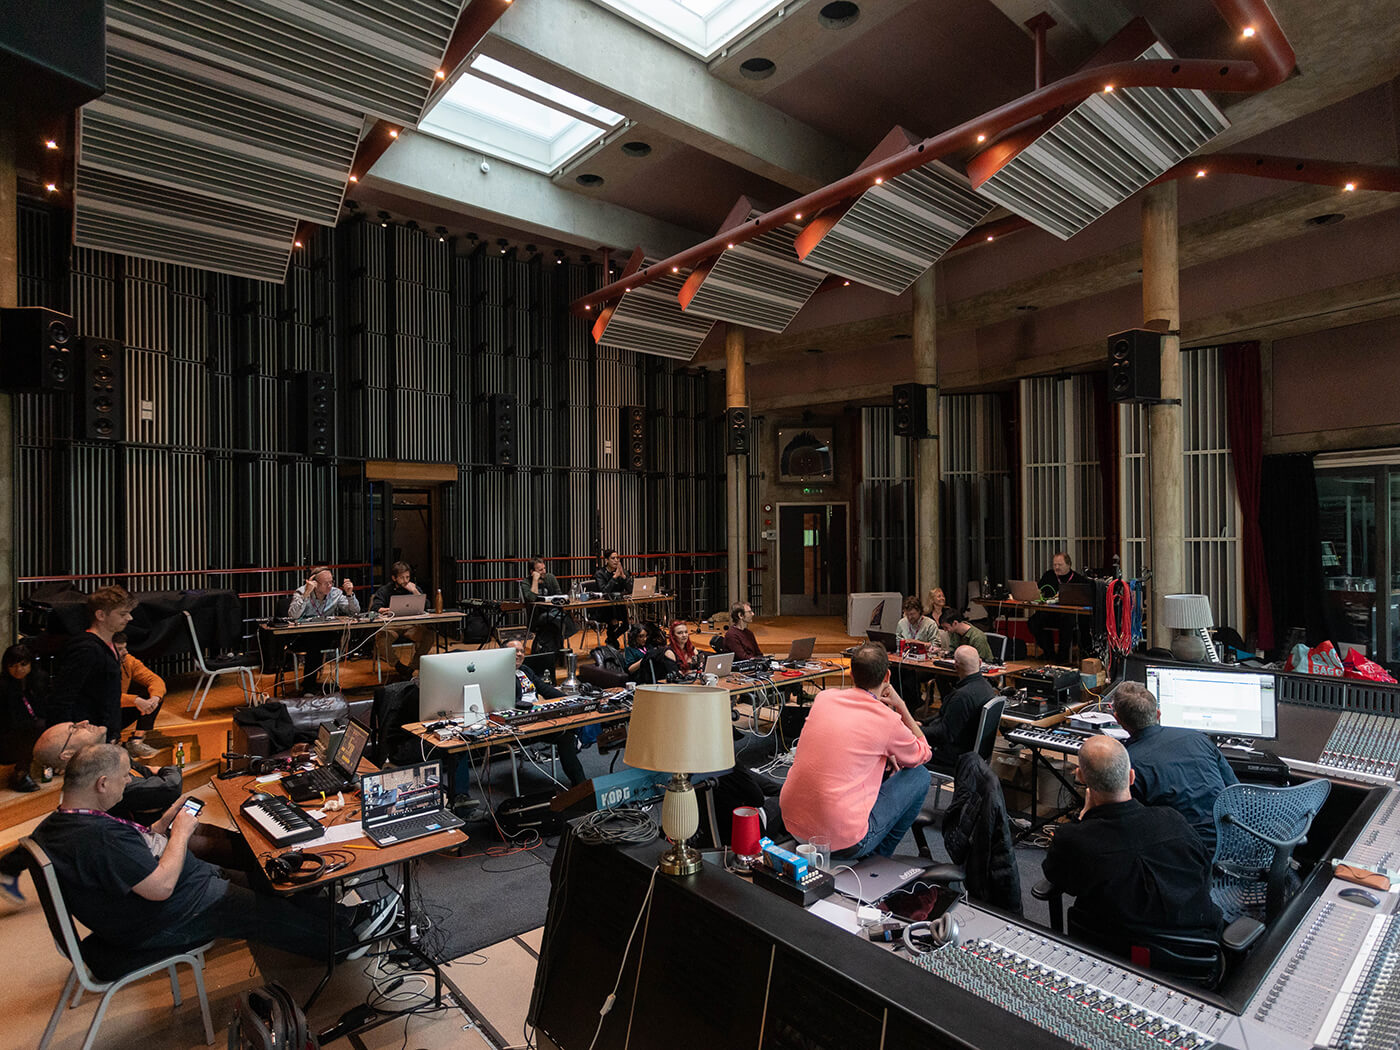 The Big Room at Real World Studios